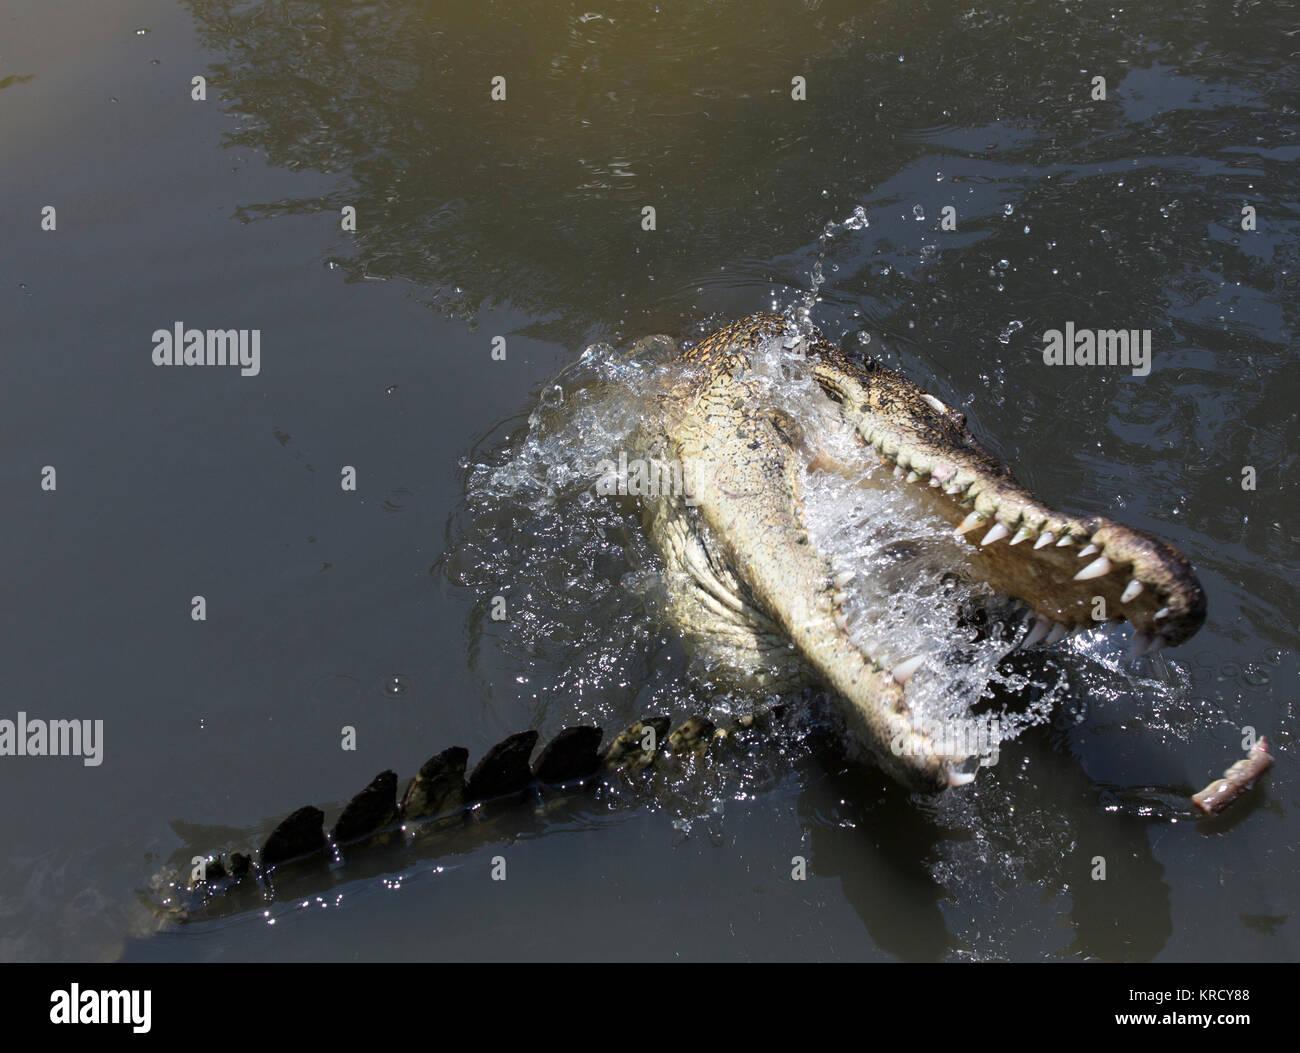 Crocodile portrait close up - Stock Image